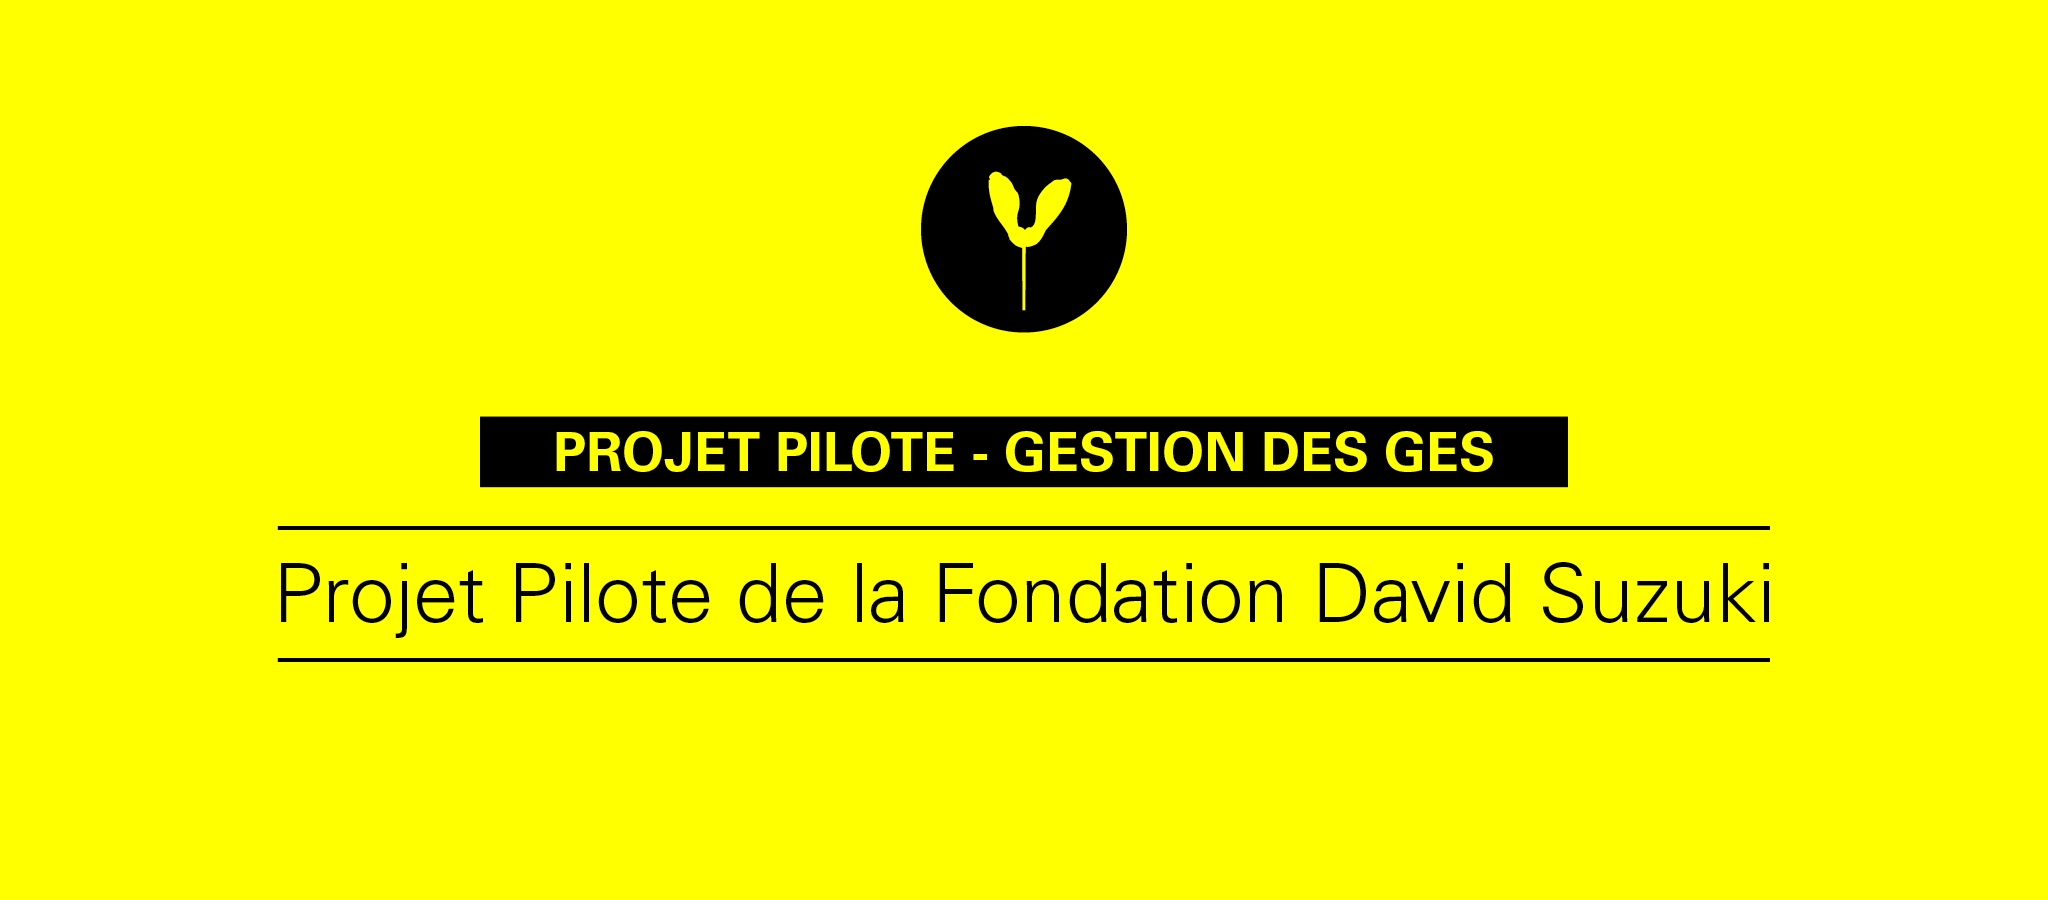 KAKEE fait partie du projet Pilote Fondation David Suzuki.